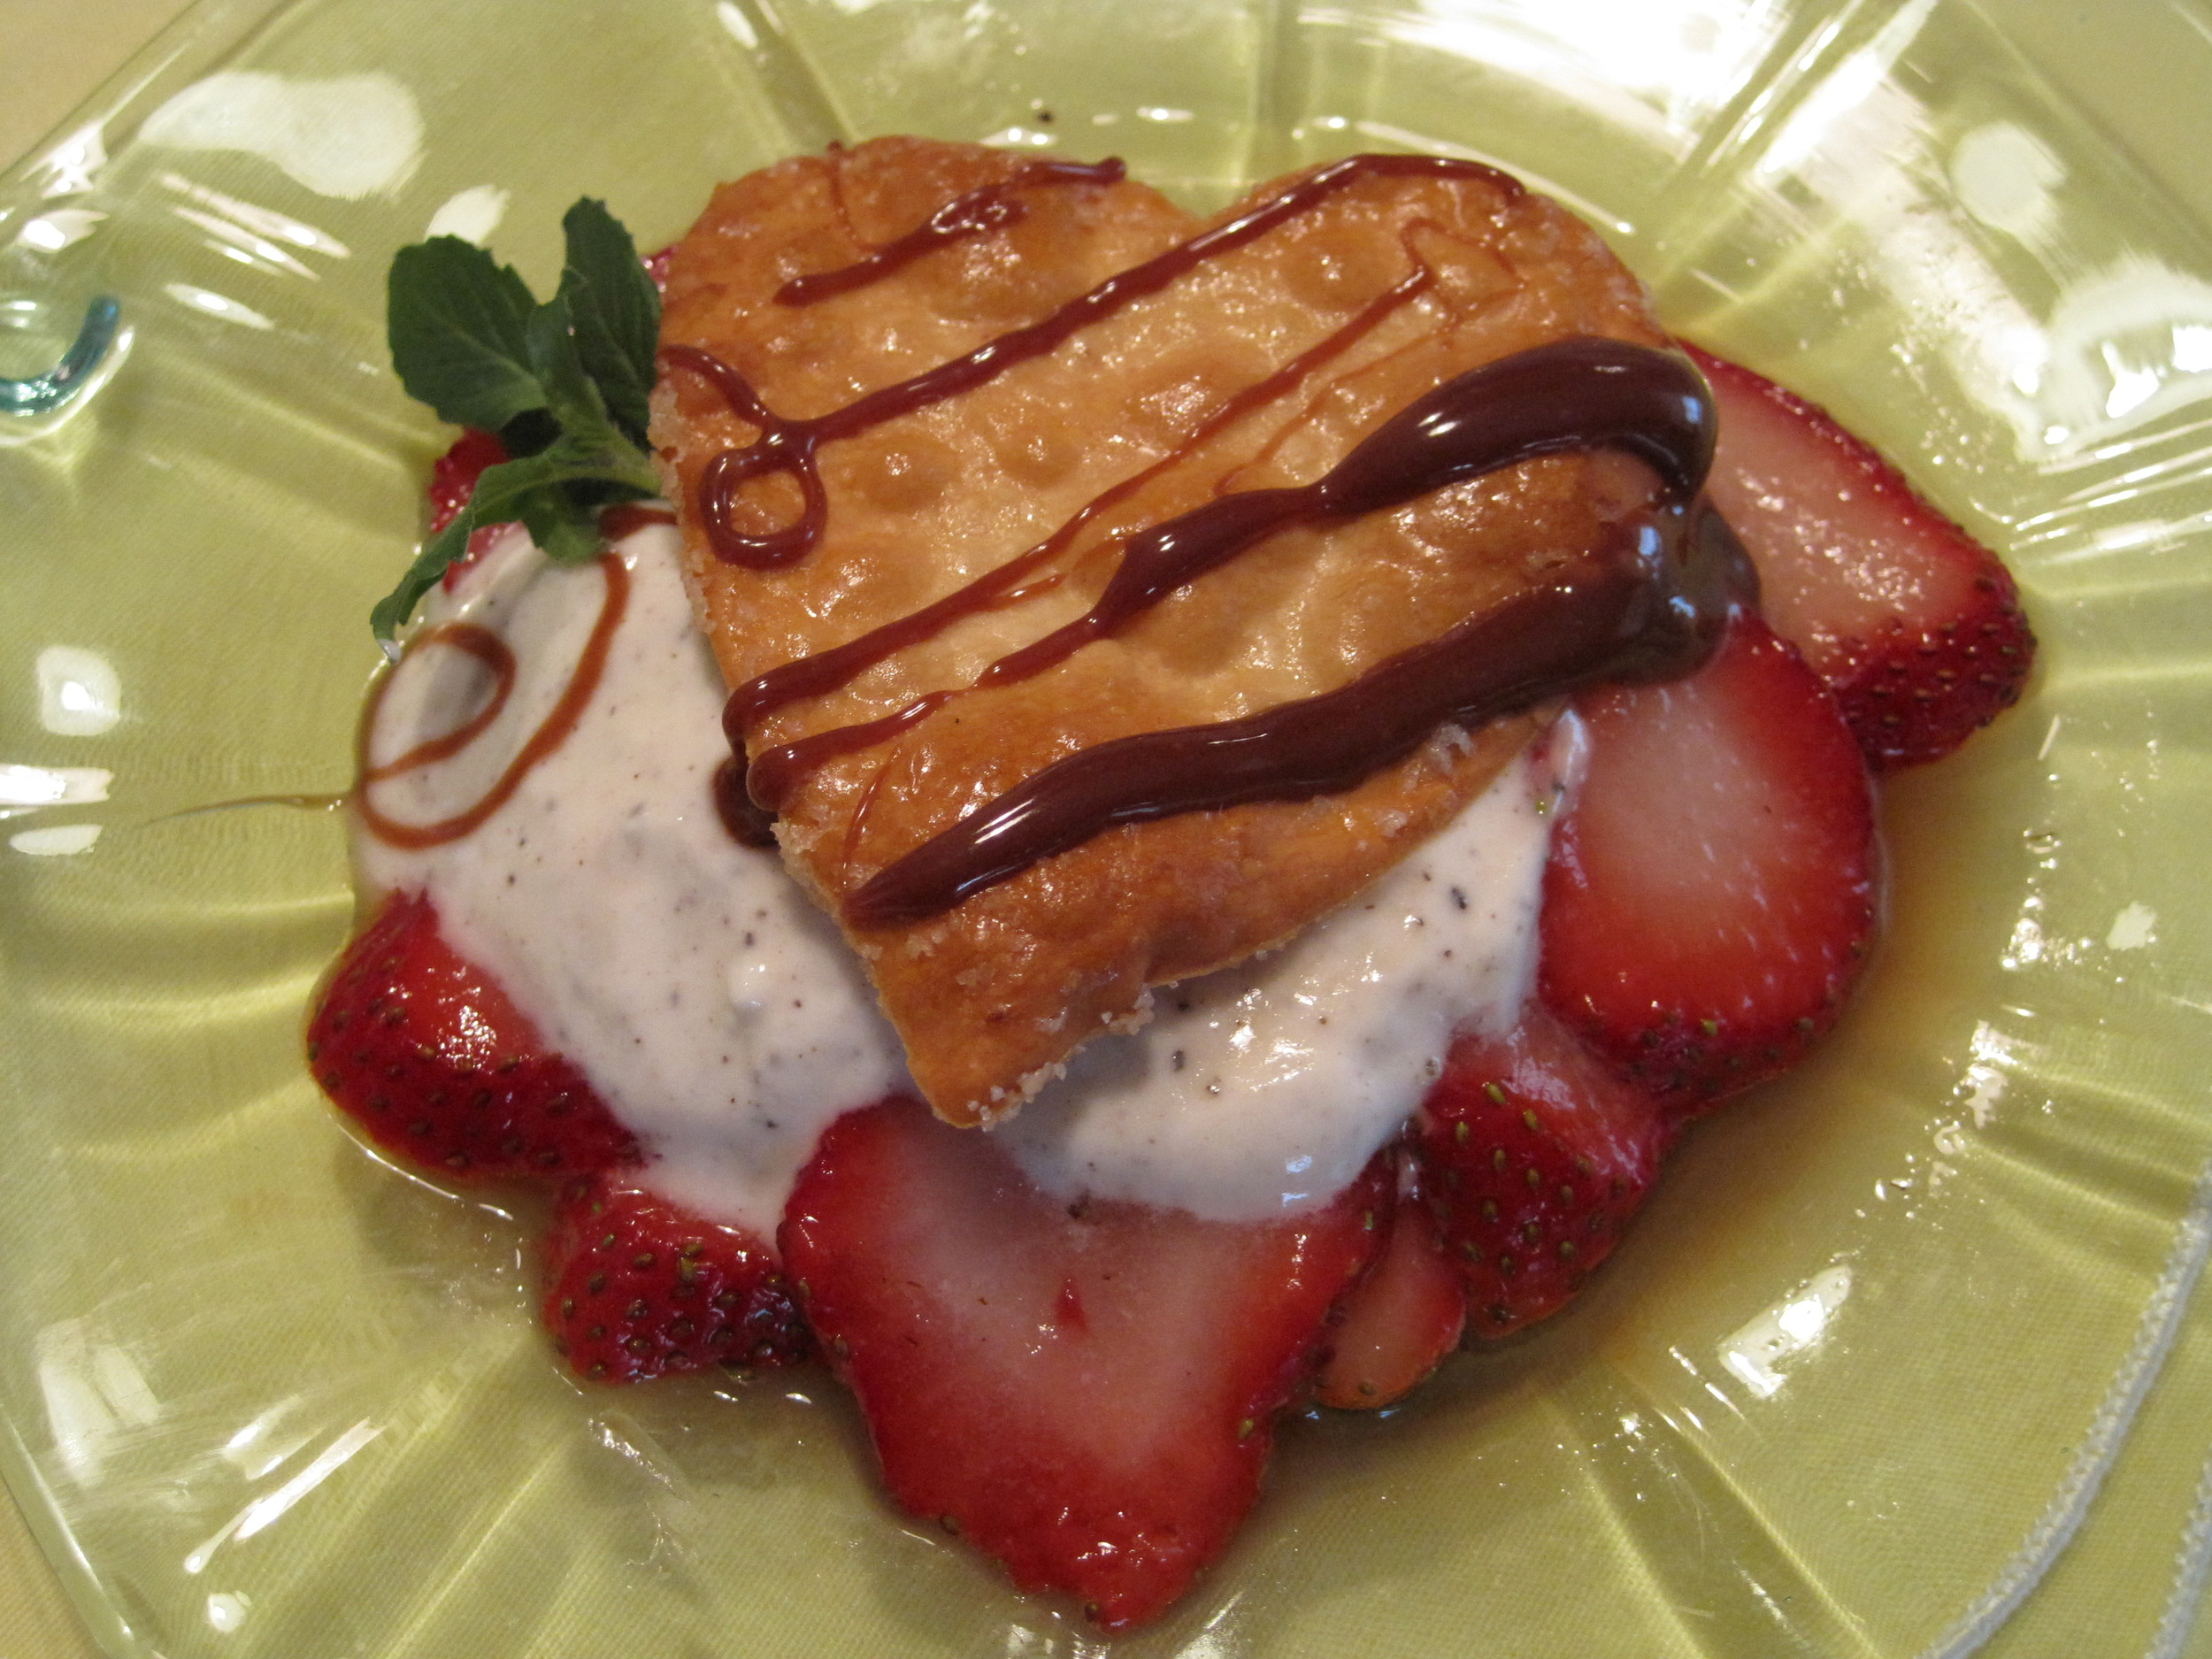 Strawberries and Crispy Wonton Bites